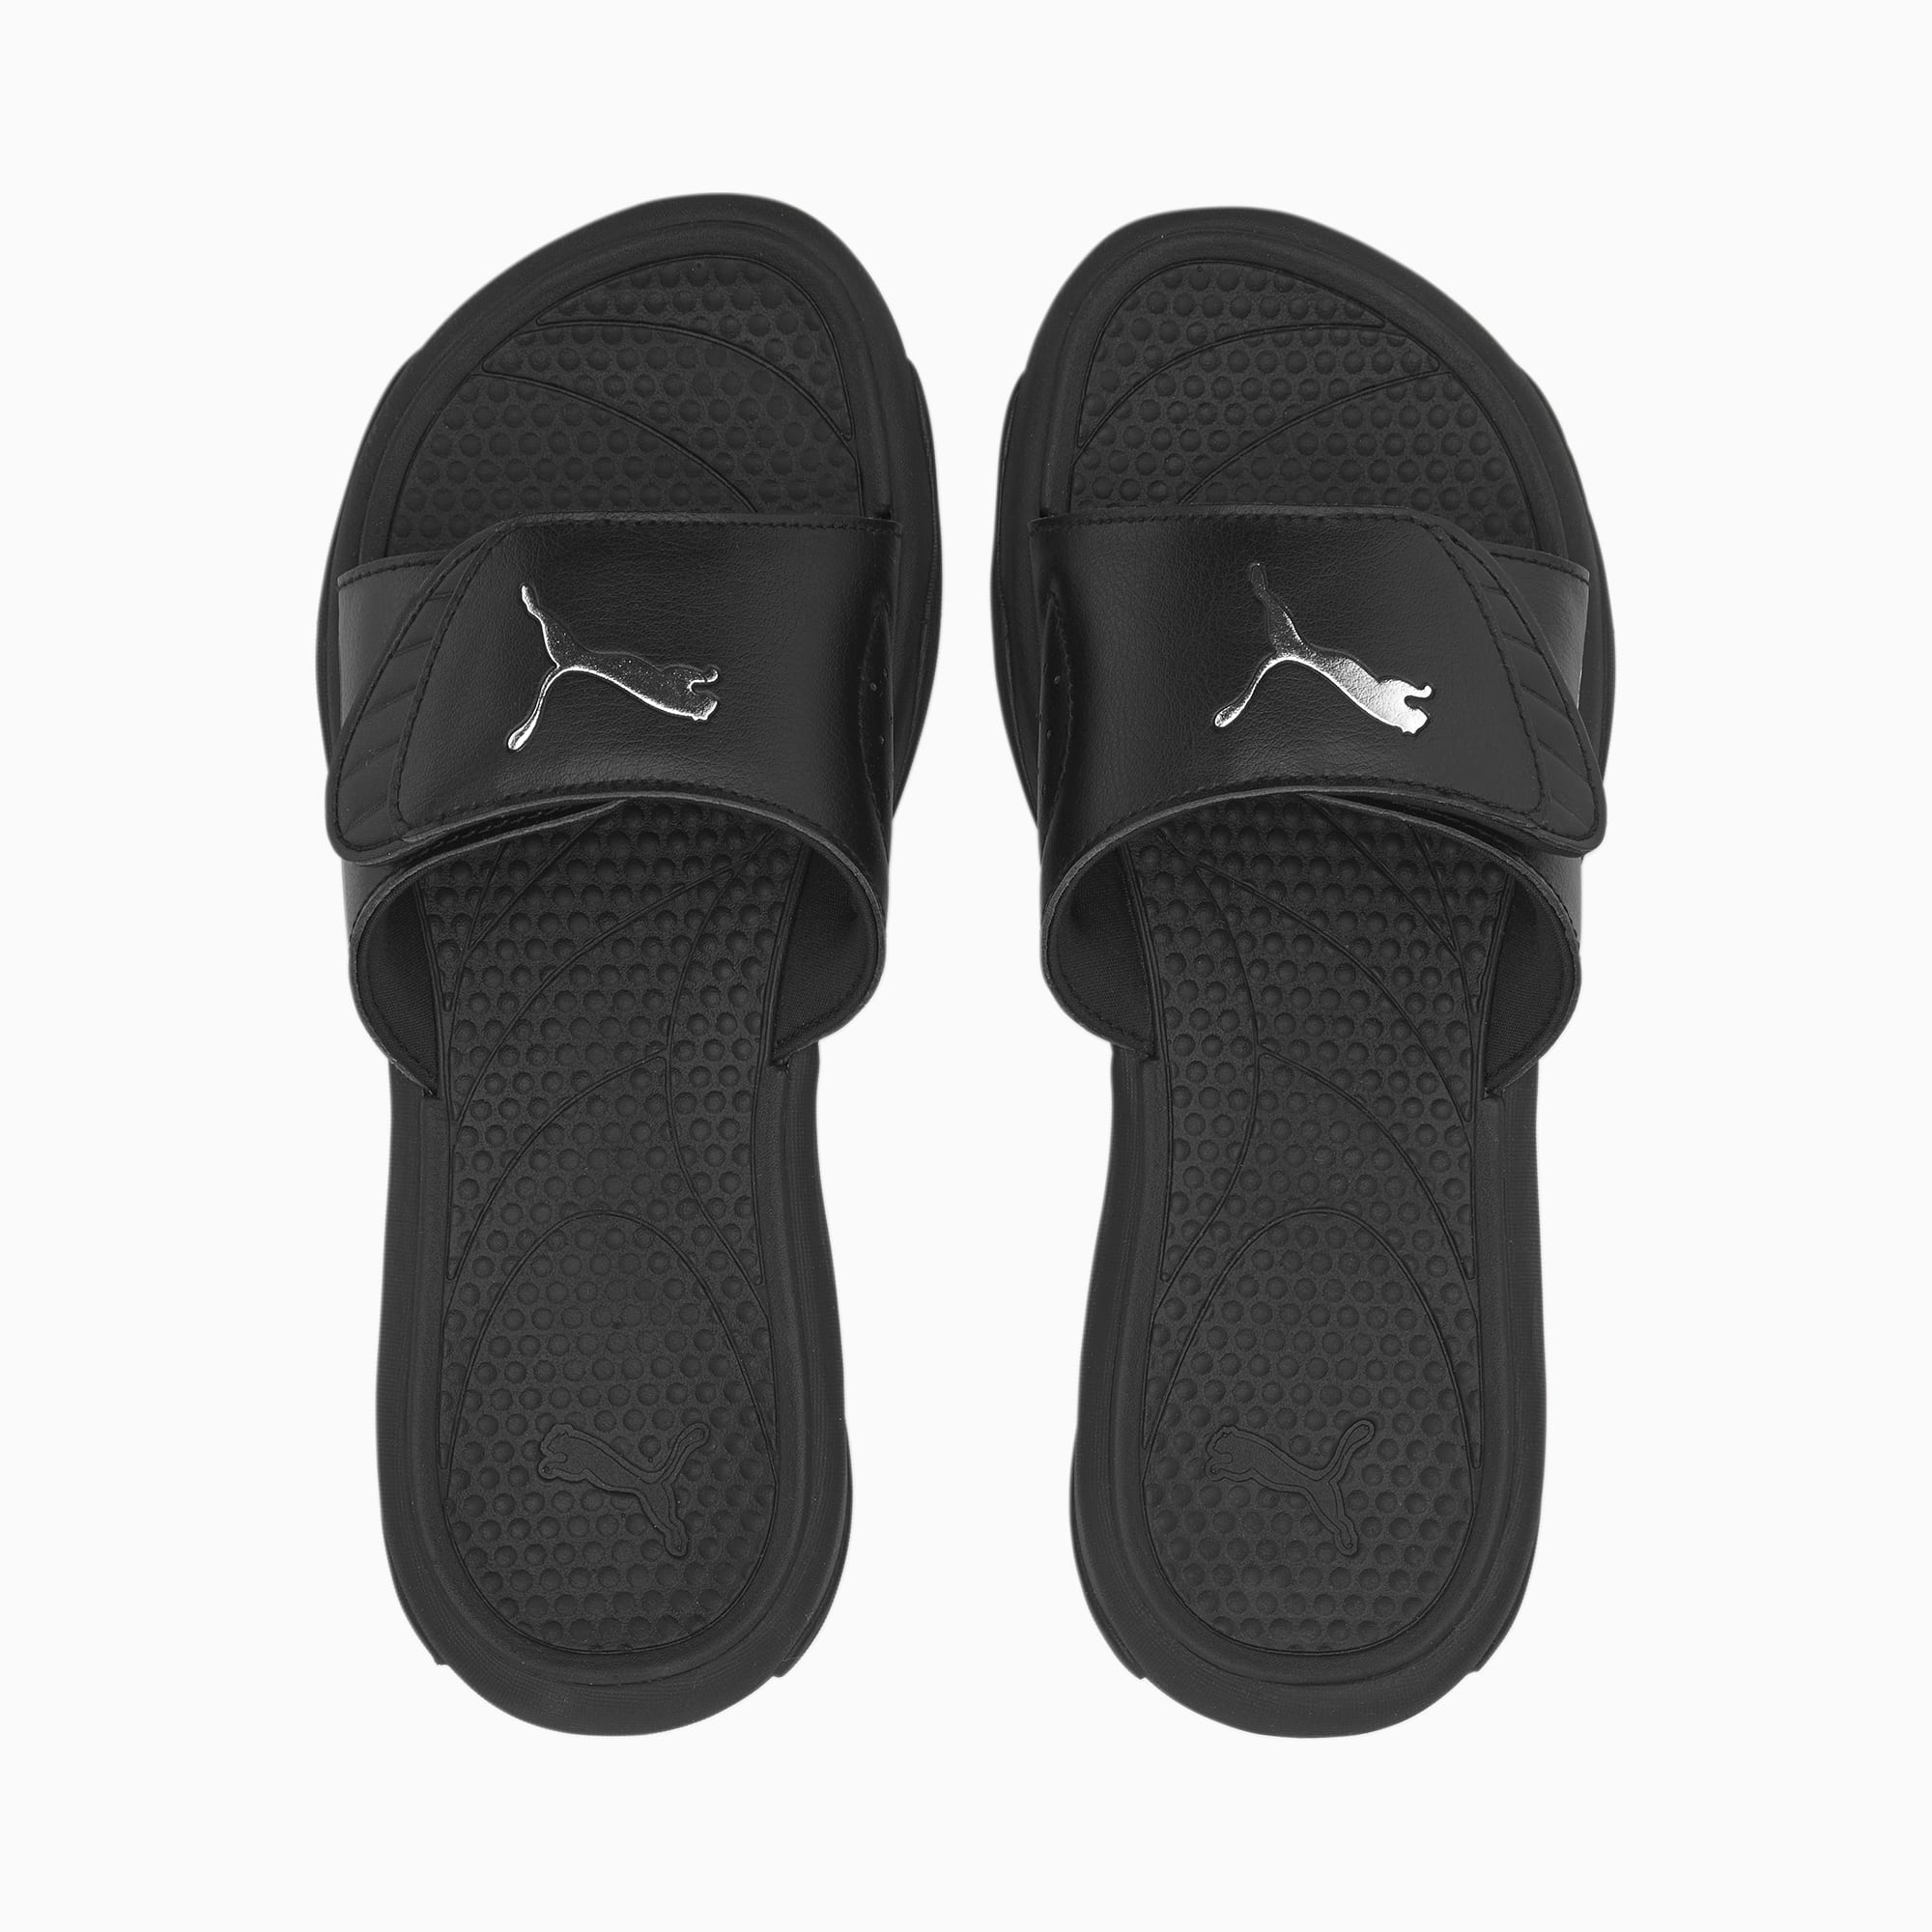 Royalcat komfortable sandaler til kvinder